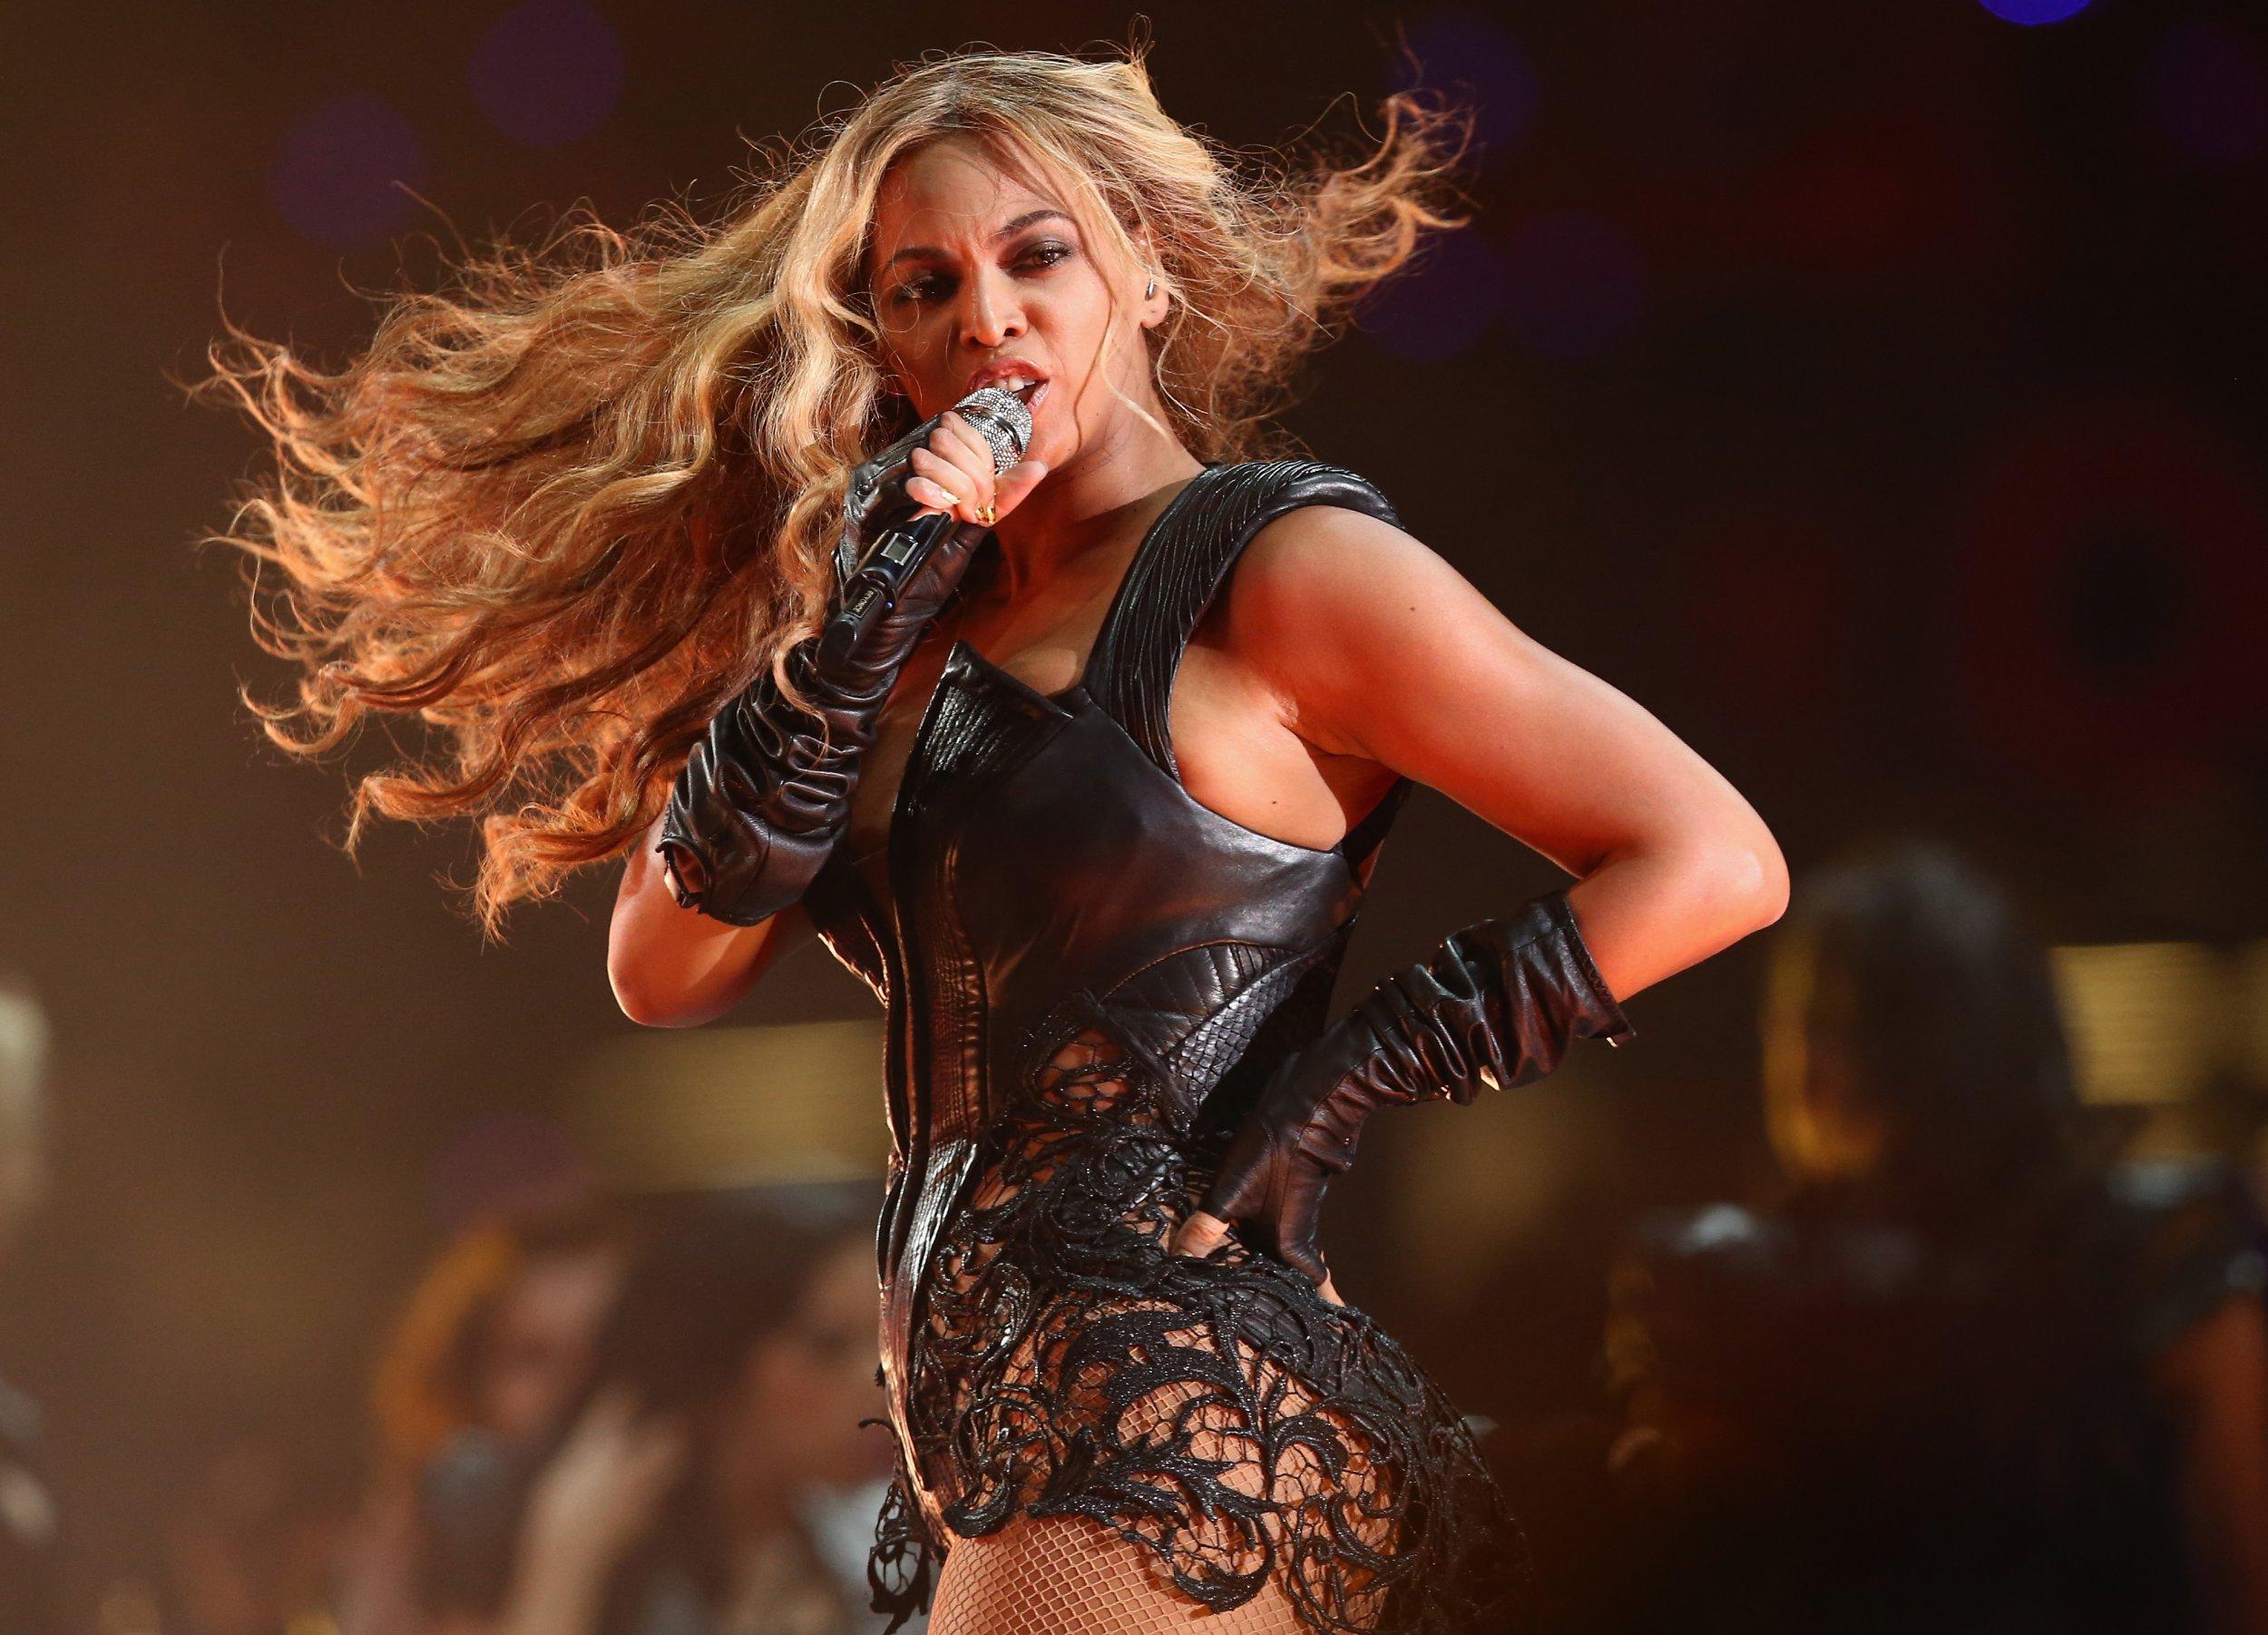 Beyonce at Super Bowl 2013